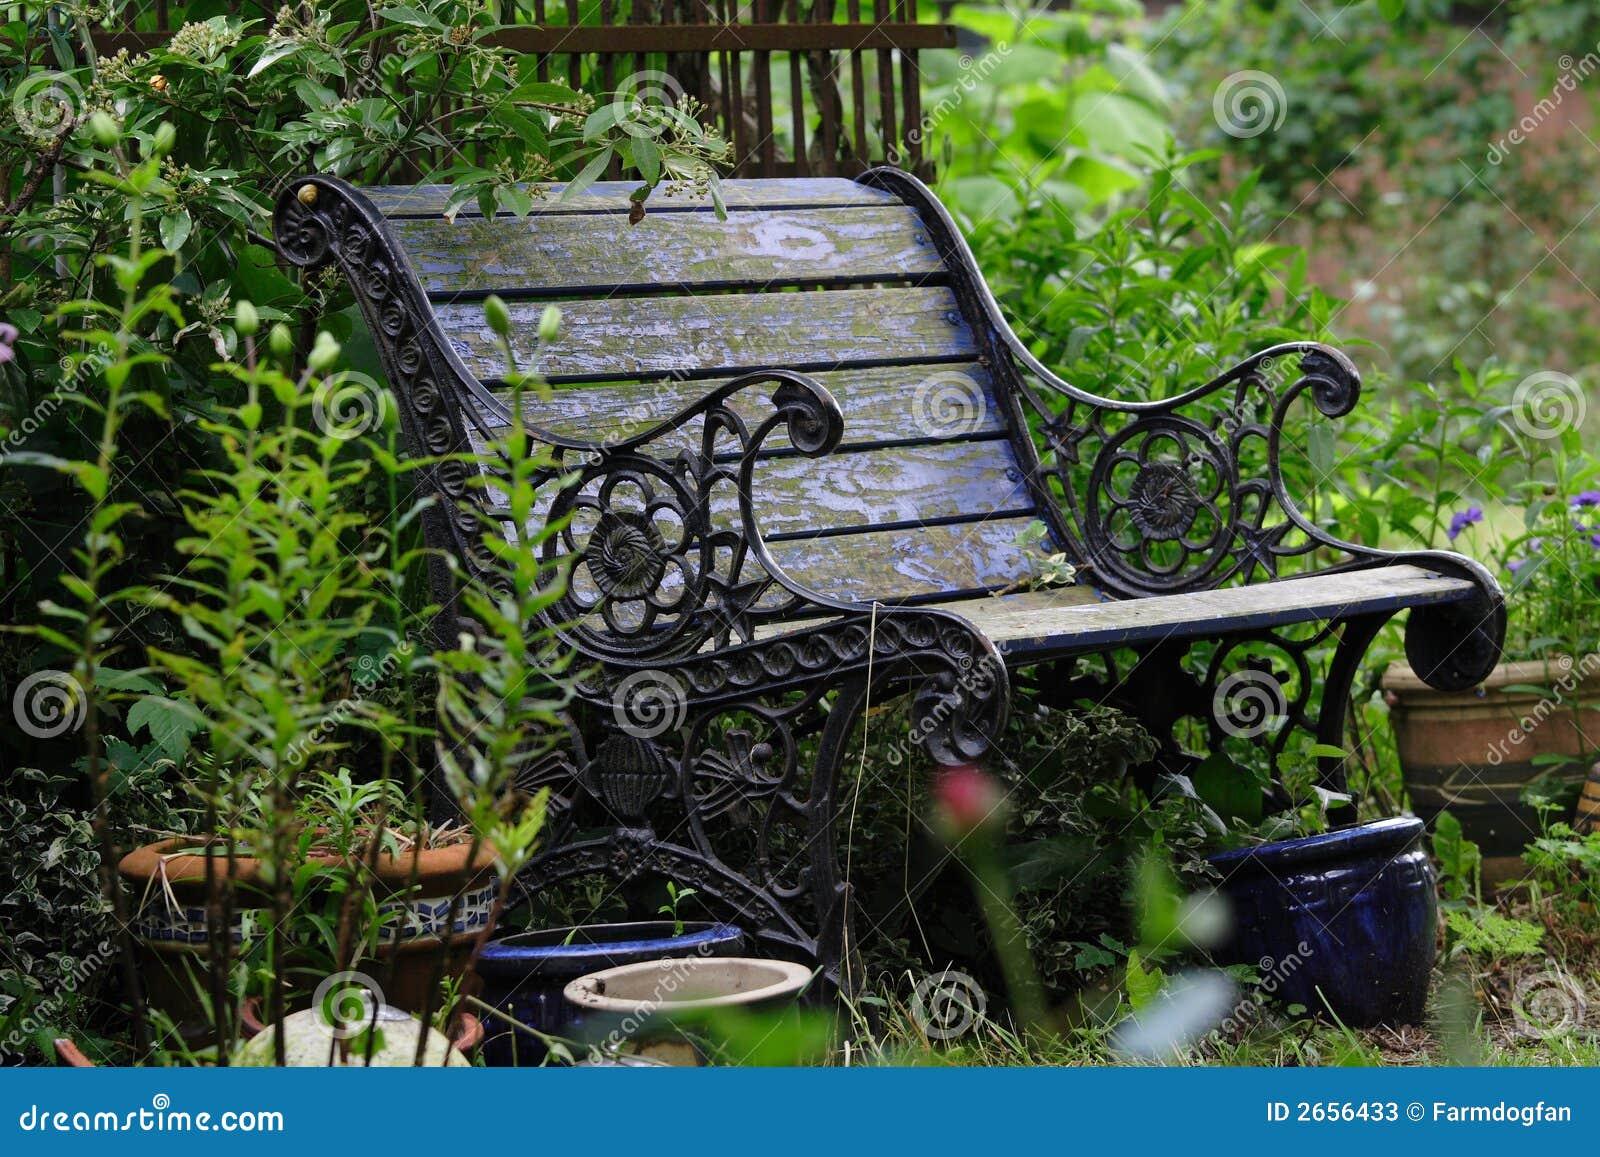 Beautiful Banc De Jardin Oxford Images - ansomone.us - ansomone.us